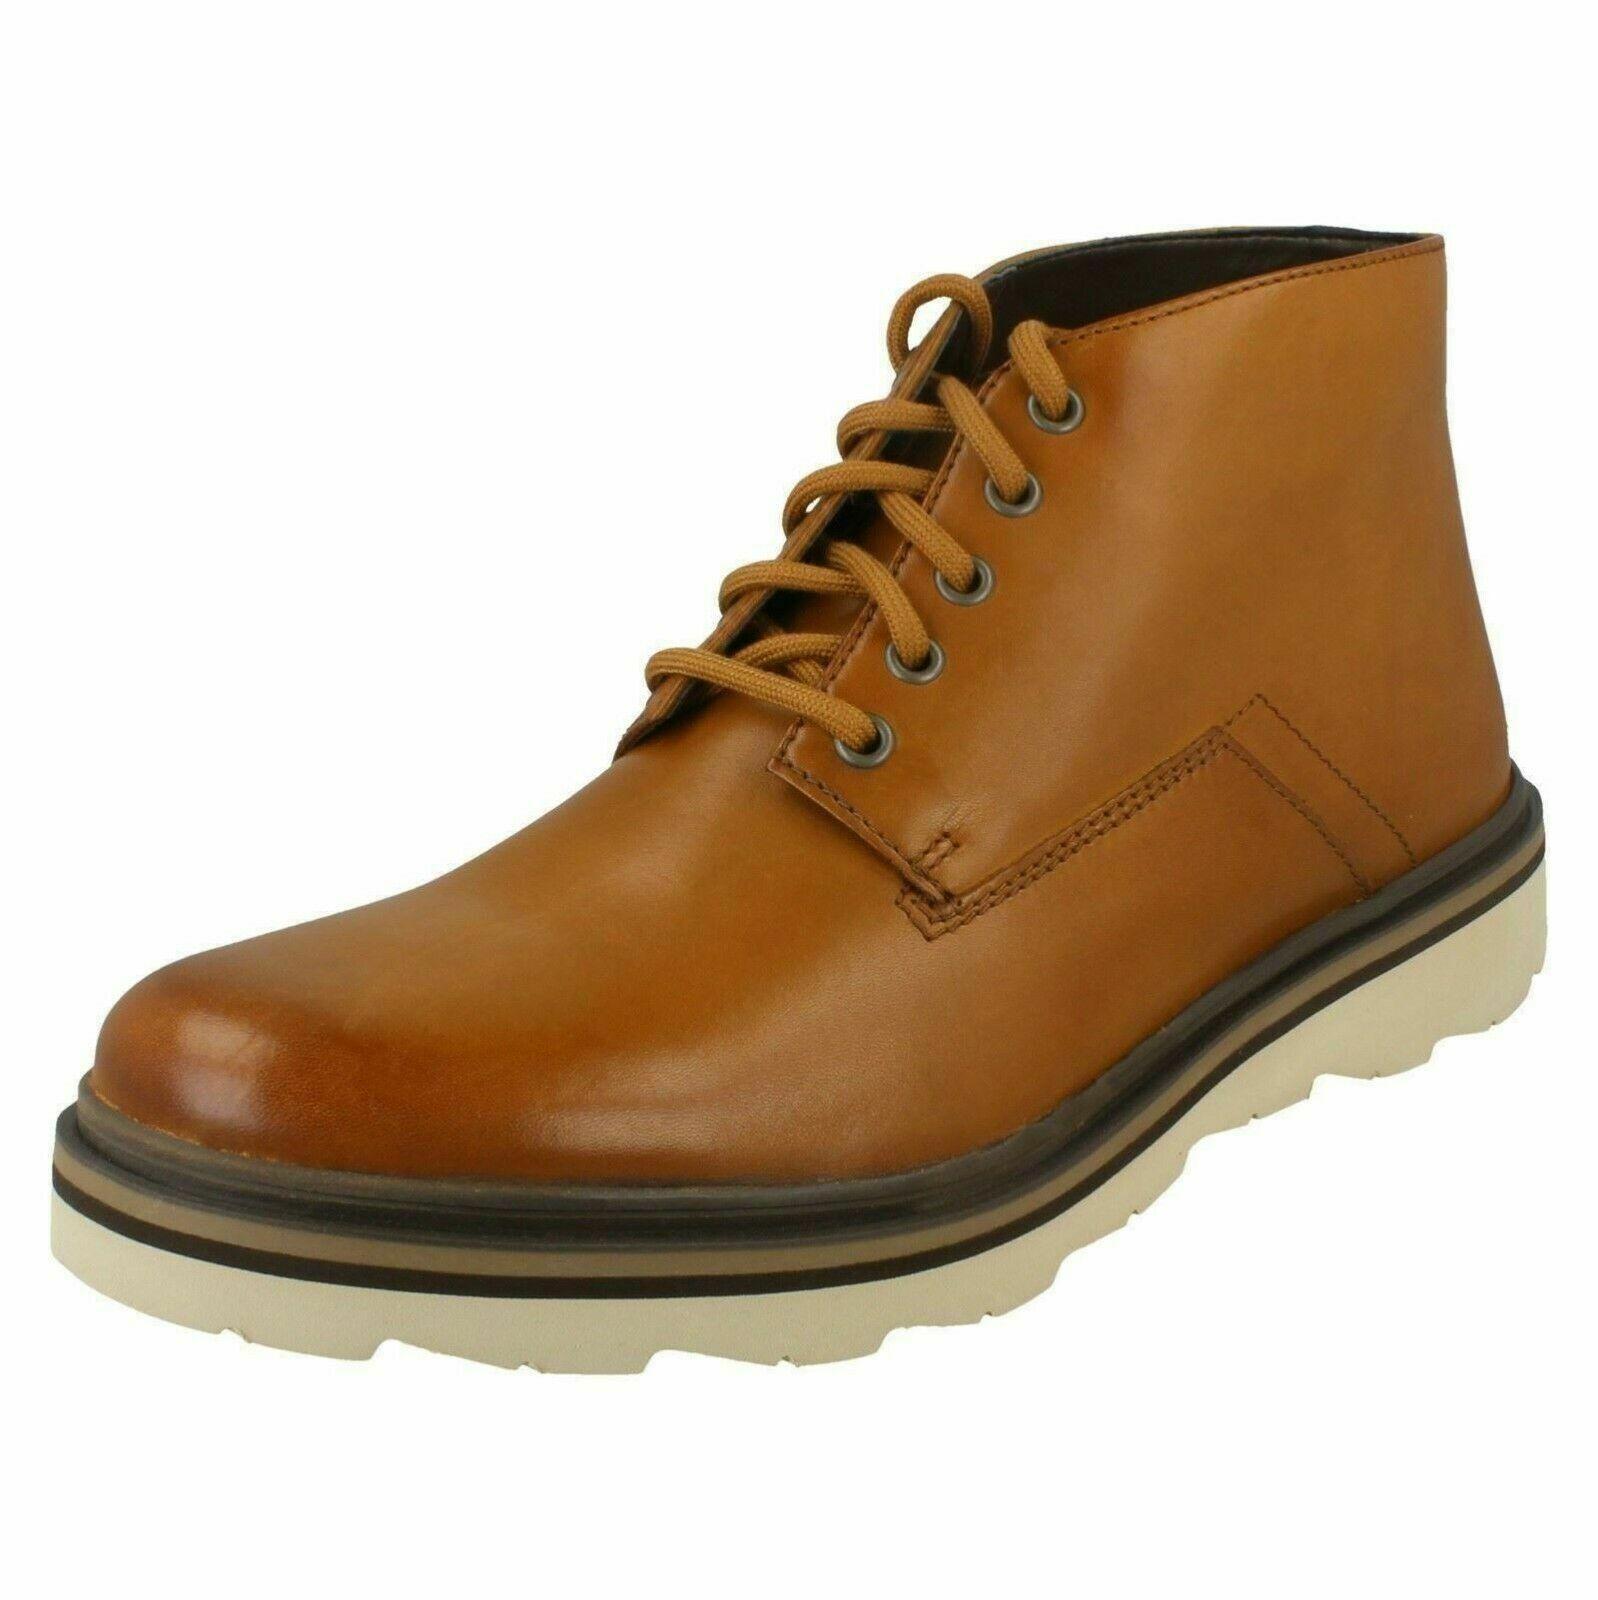 Mens Clarks Cognac Leather Lace Boots : Frelan Mid